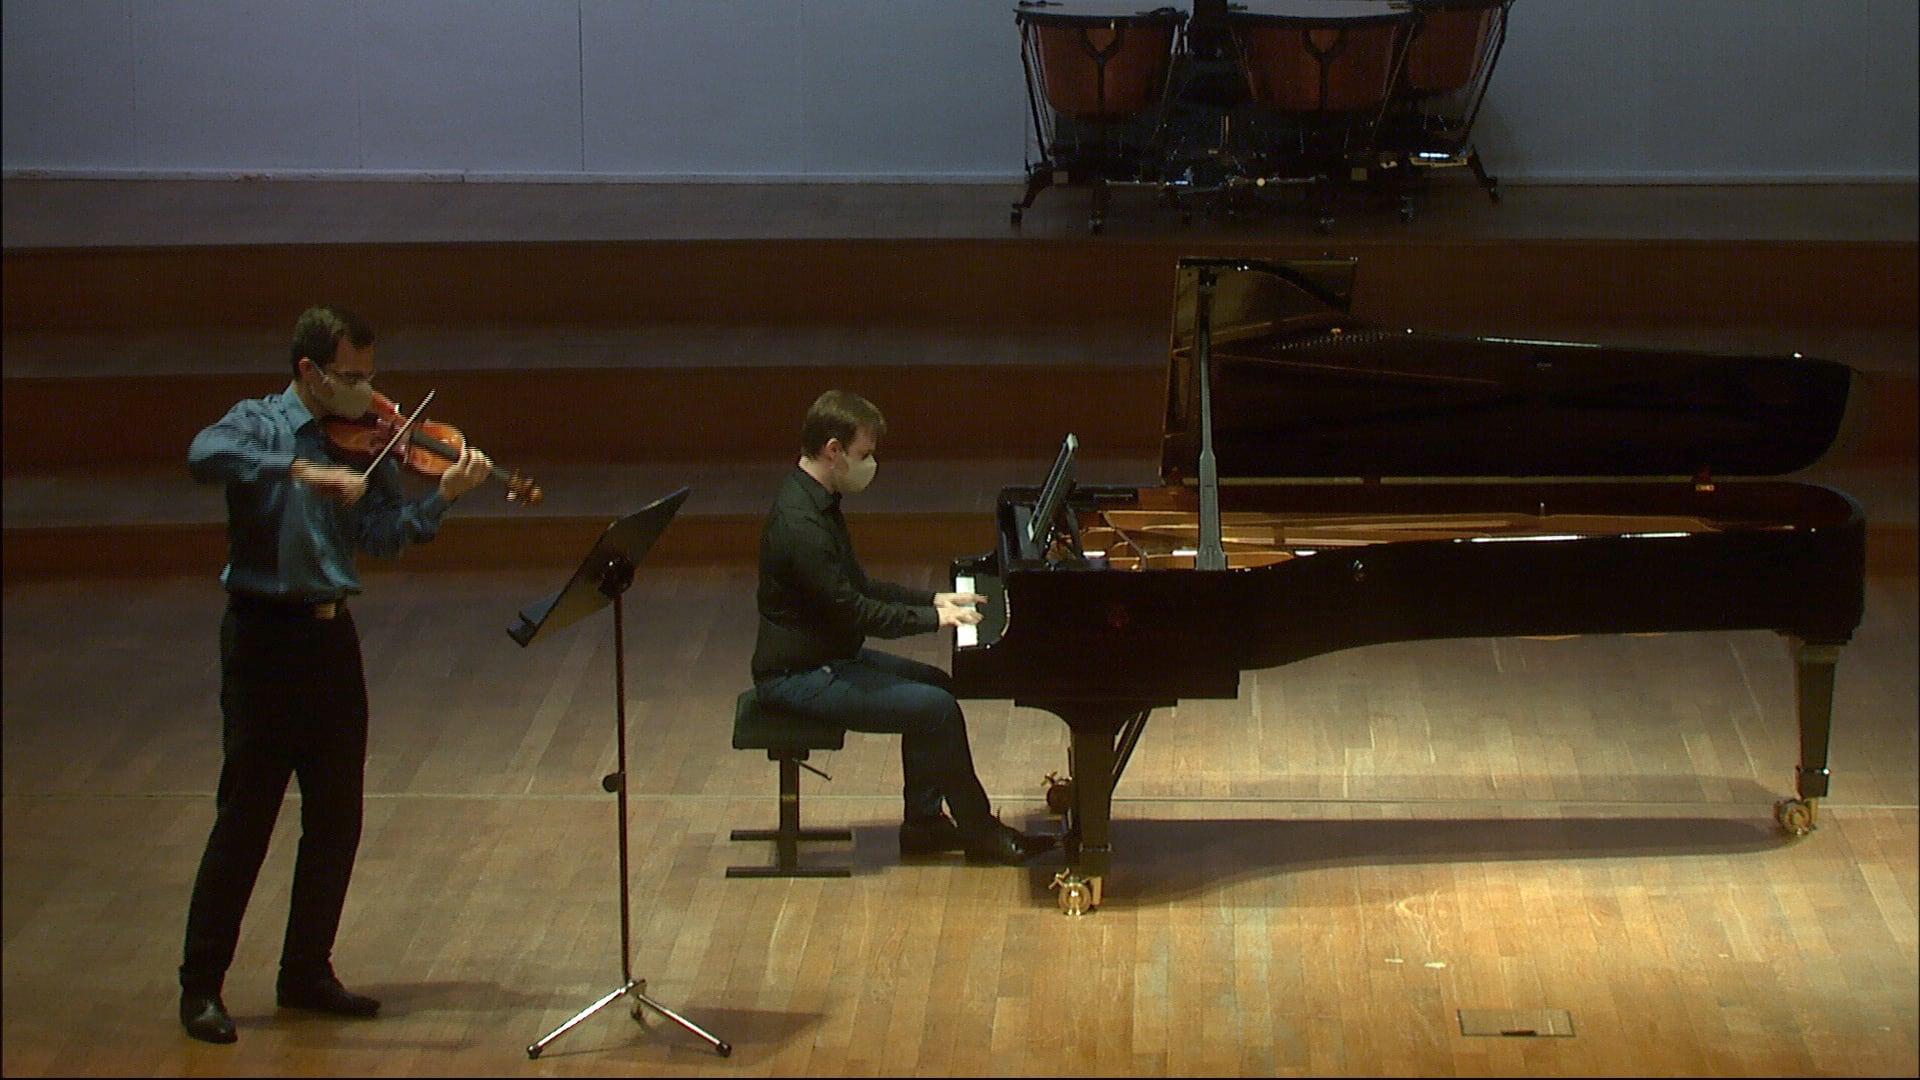 Koncerty bez publika II / Sperger Duo / Tomka / Klátik